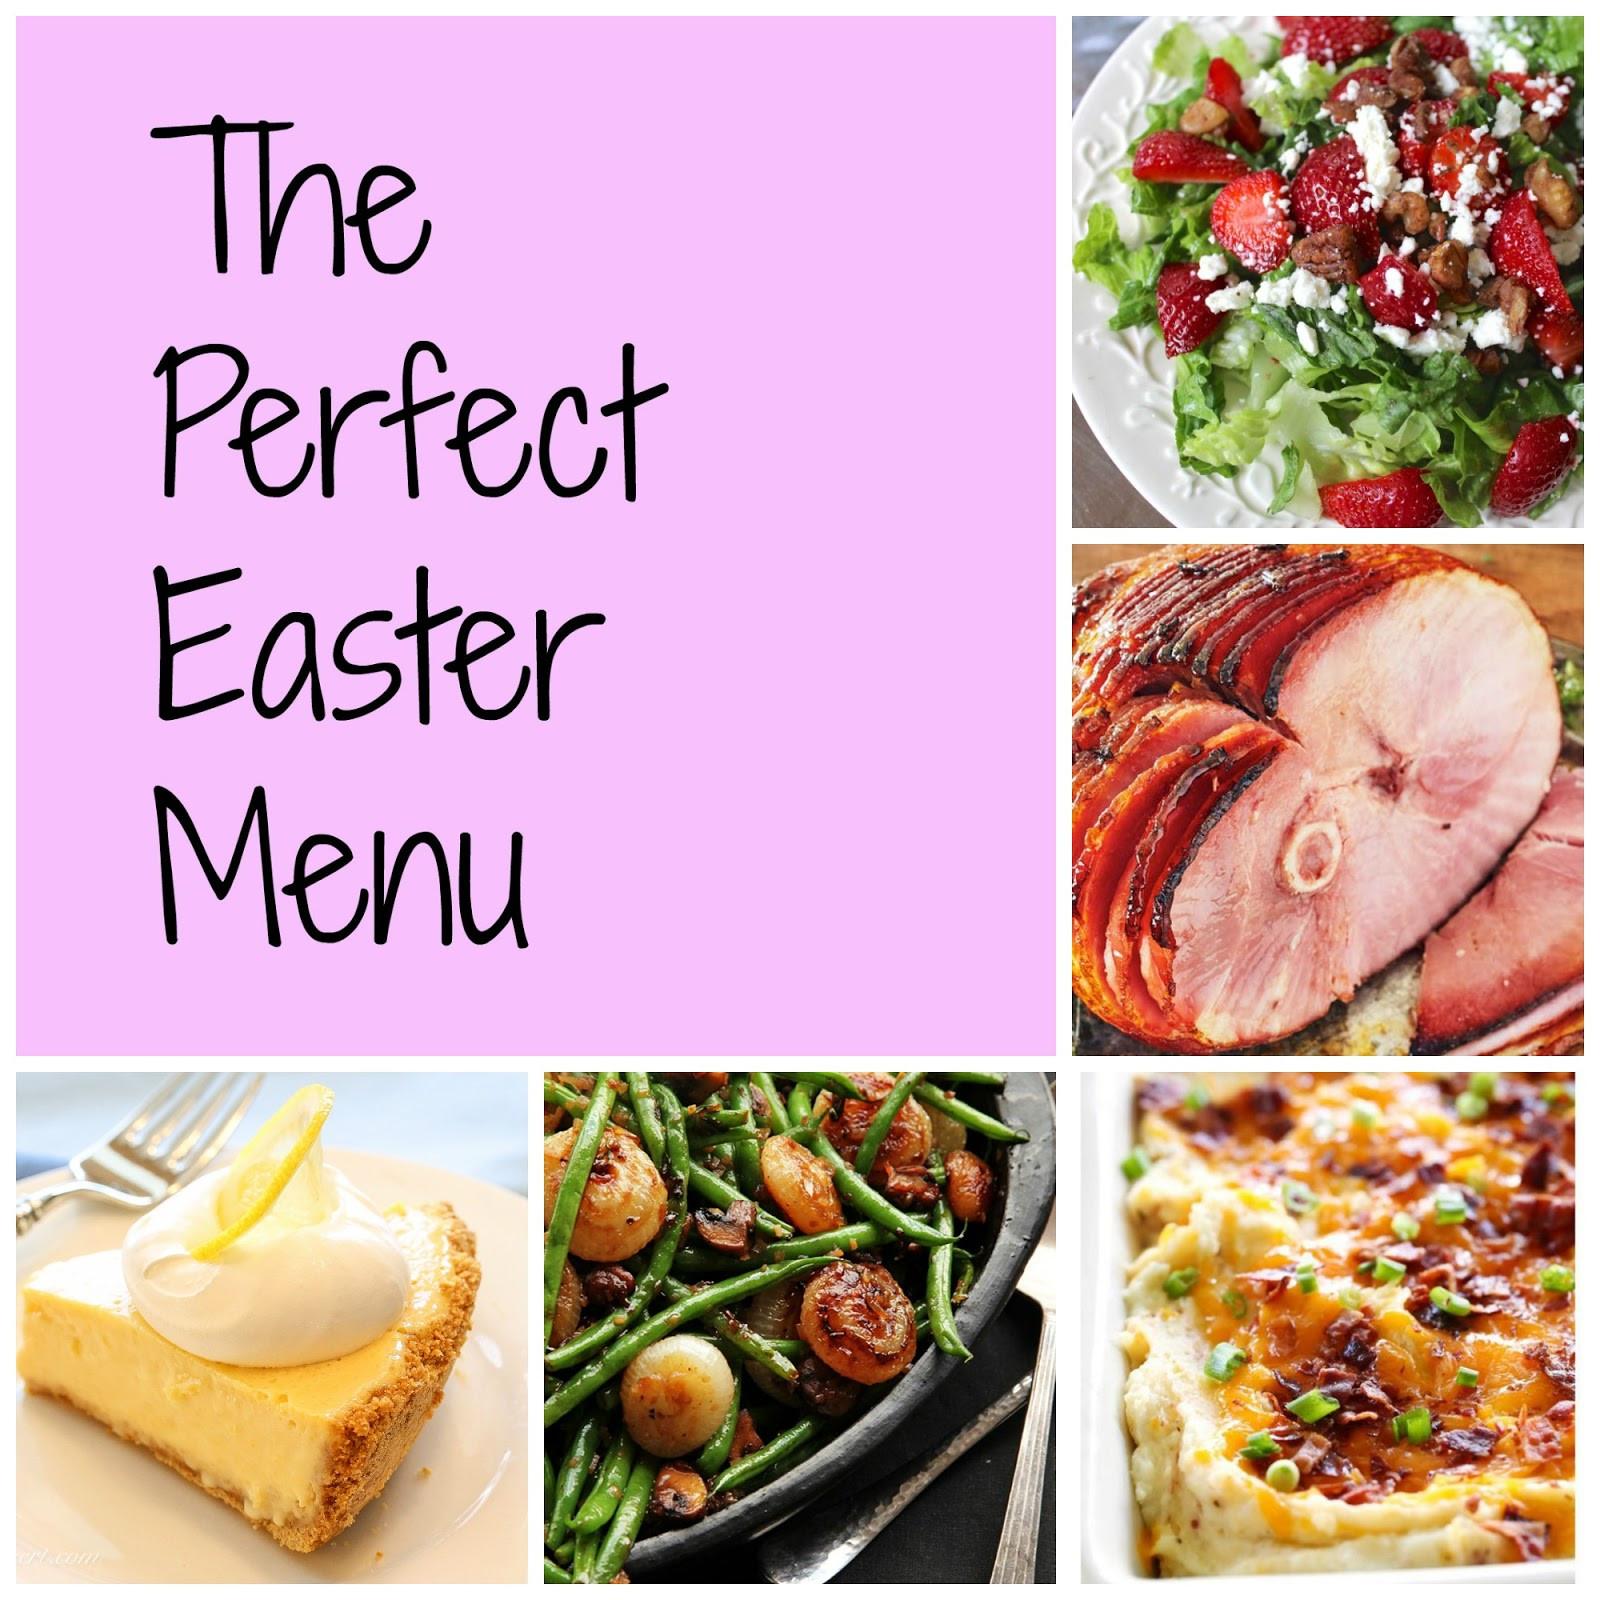 Perfect Easter Dinner Menu  The Horton Family The Perfect Easter Menu